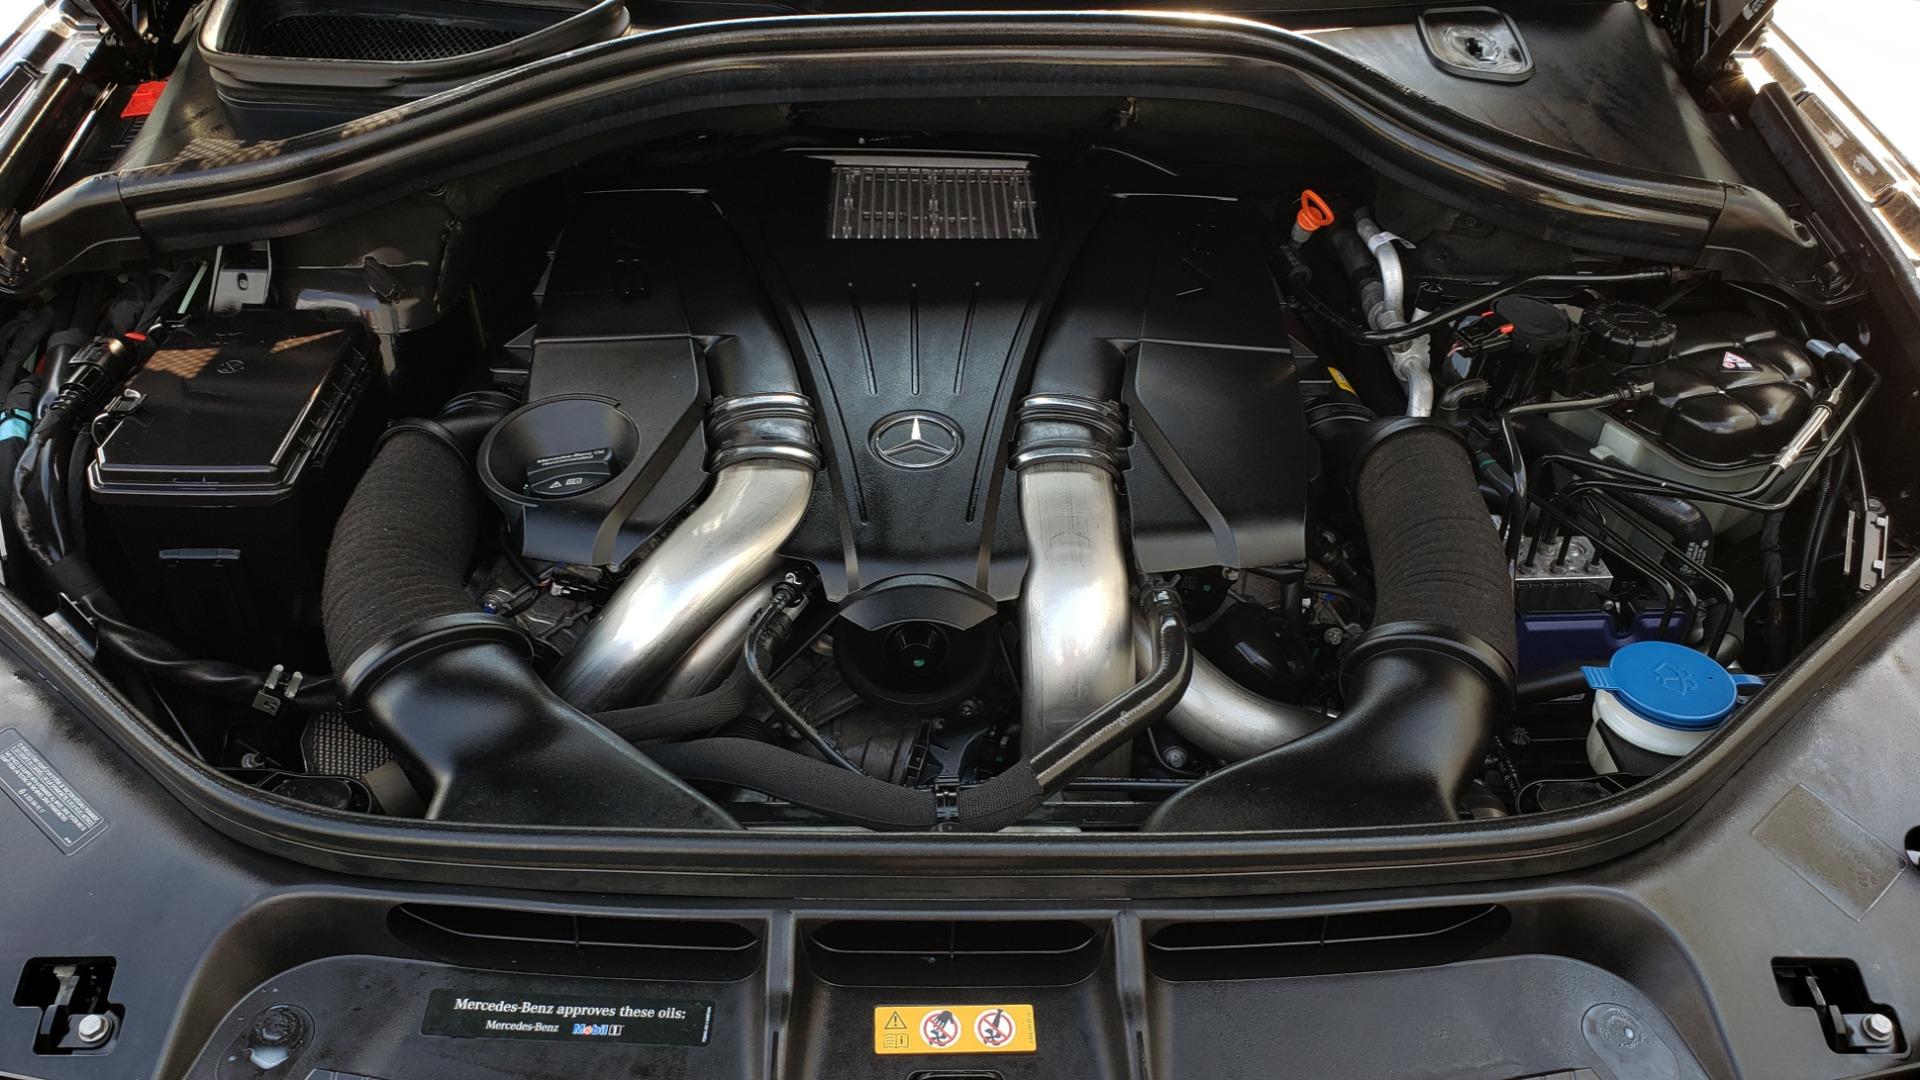 Used 2017 Mercedes-Benz GLS GLS 550 for sale Sold at Formula Imports in Charlotte NC 28227 13